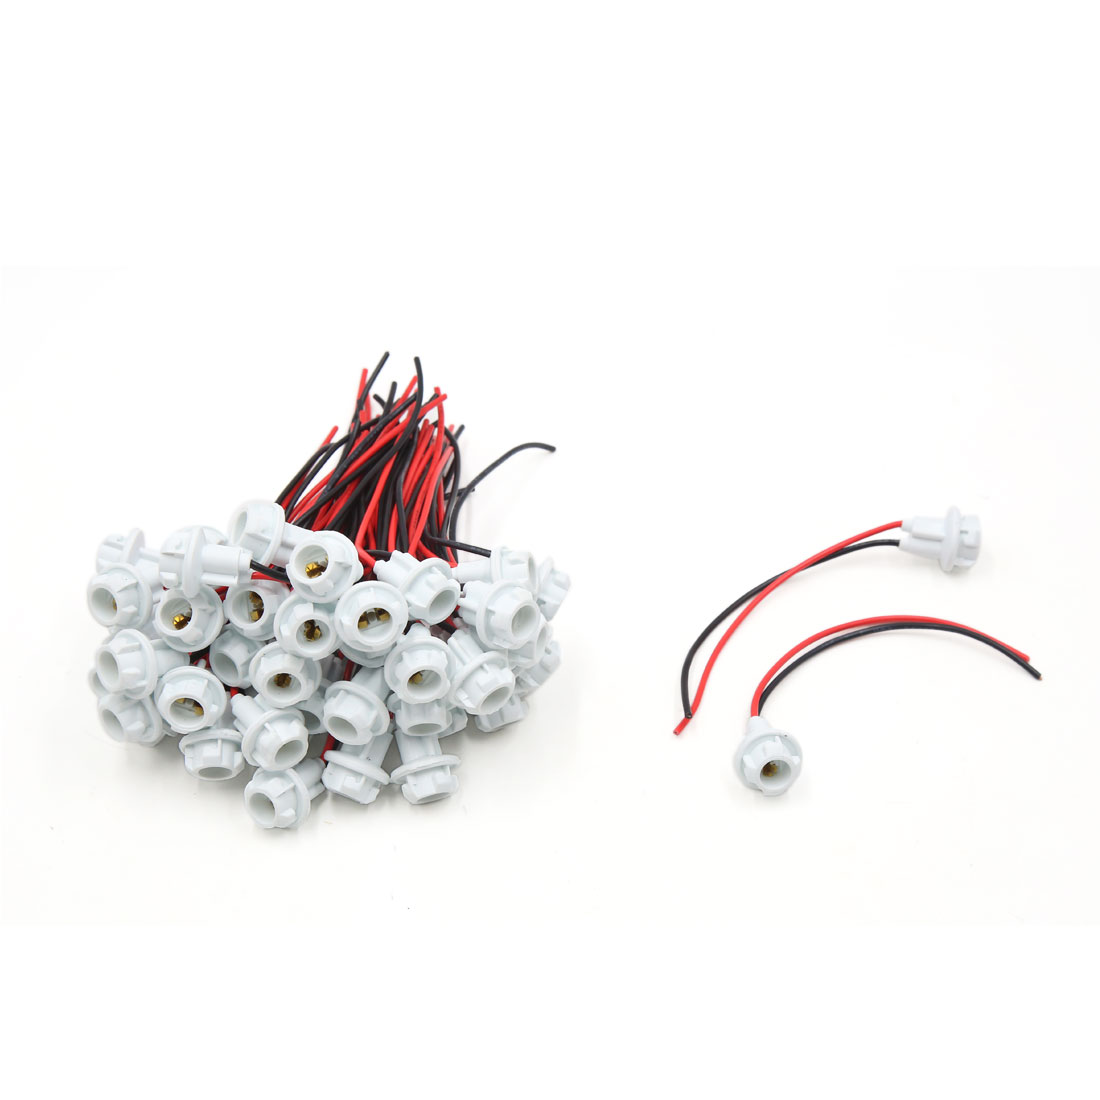 Hid Kit Wiring Harness